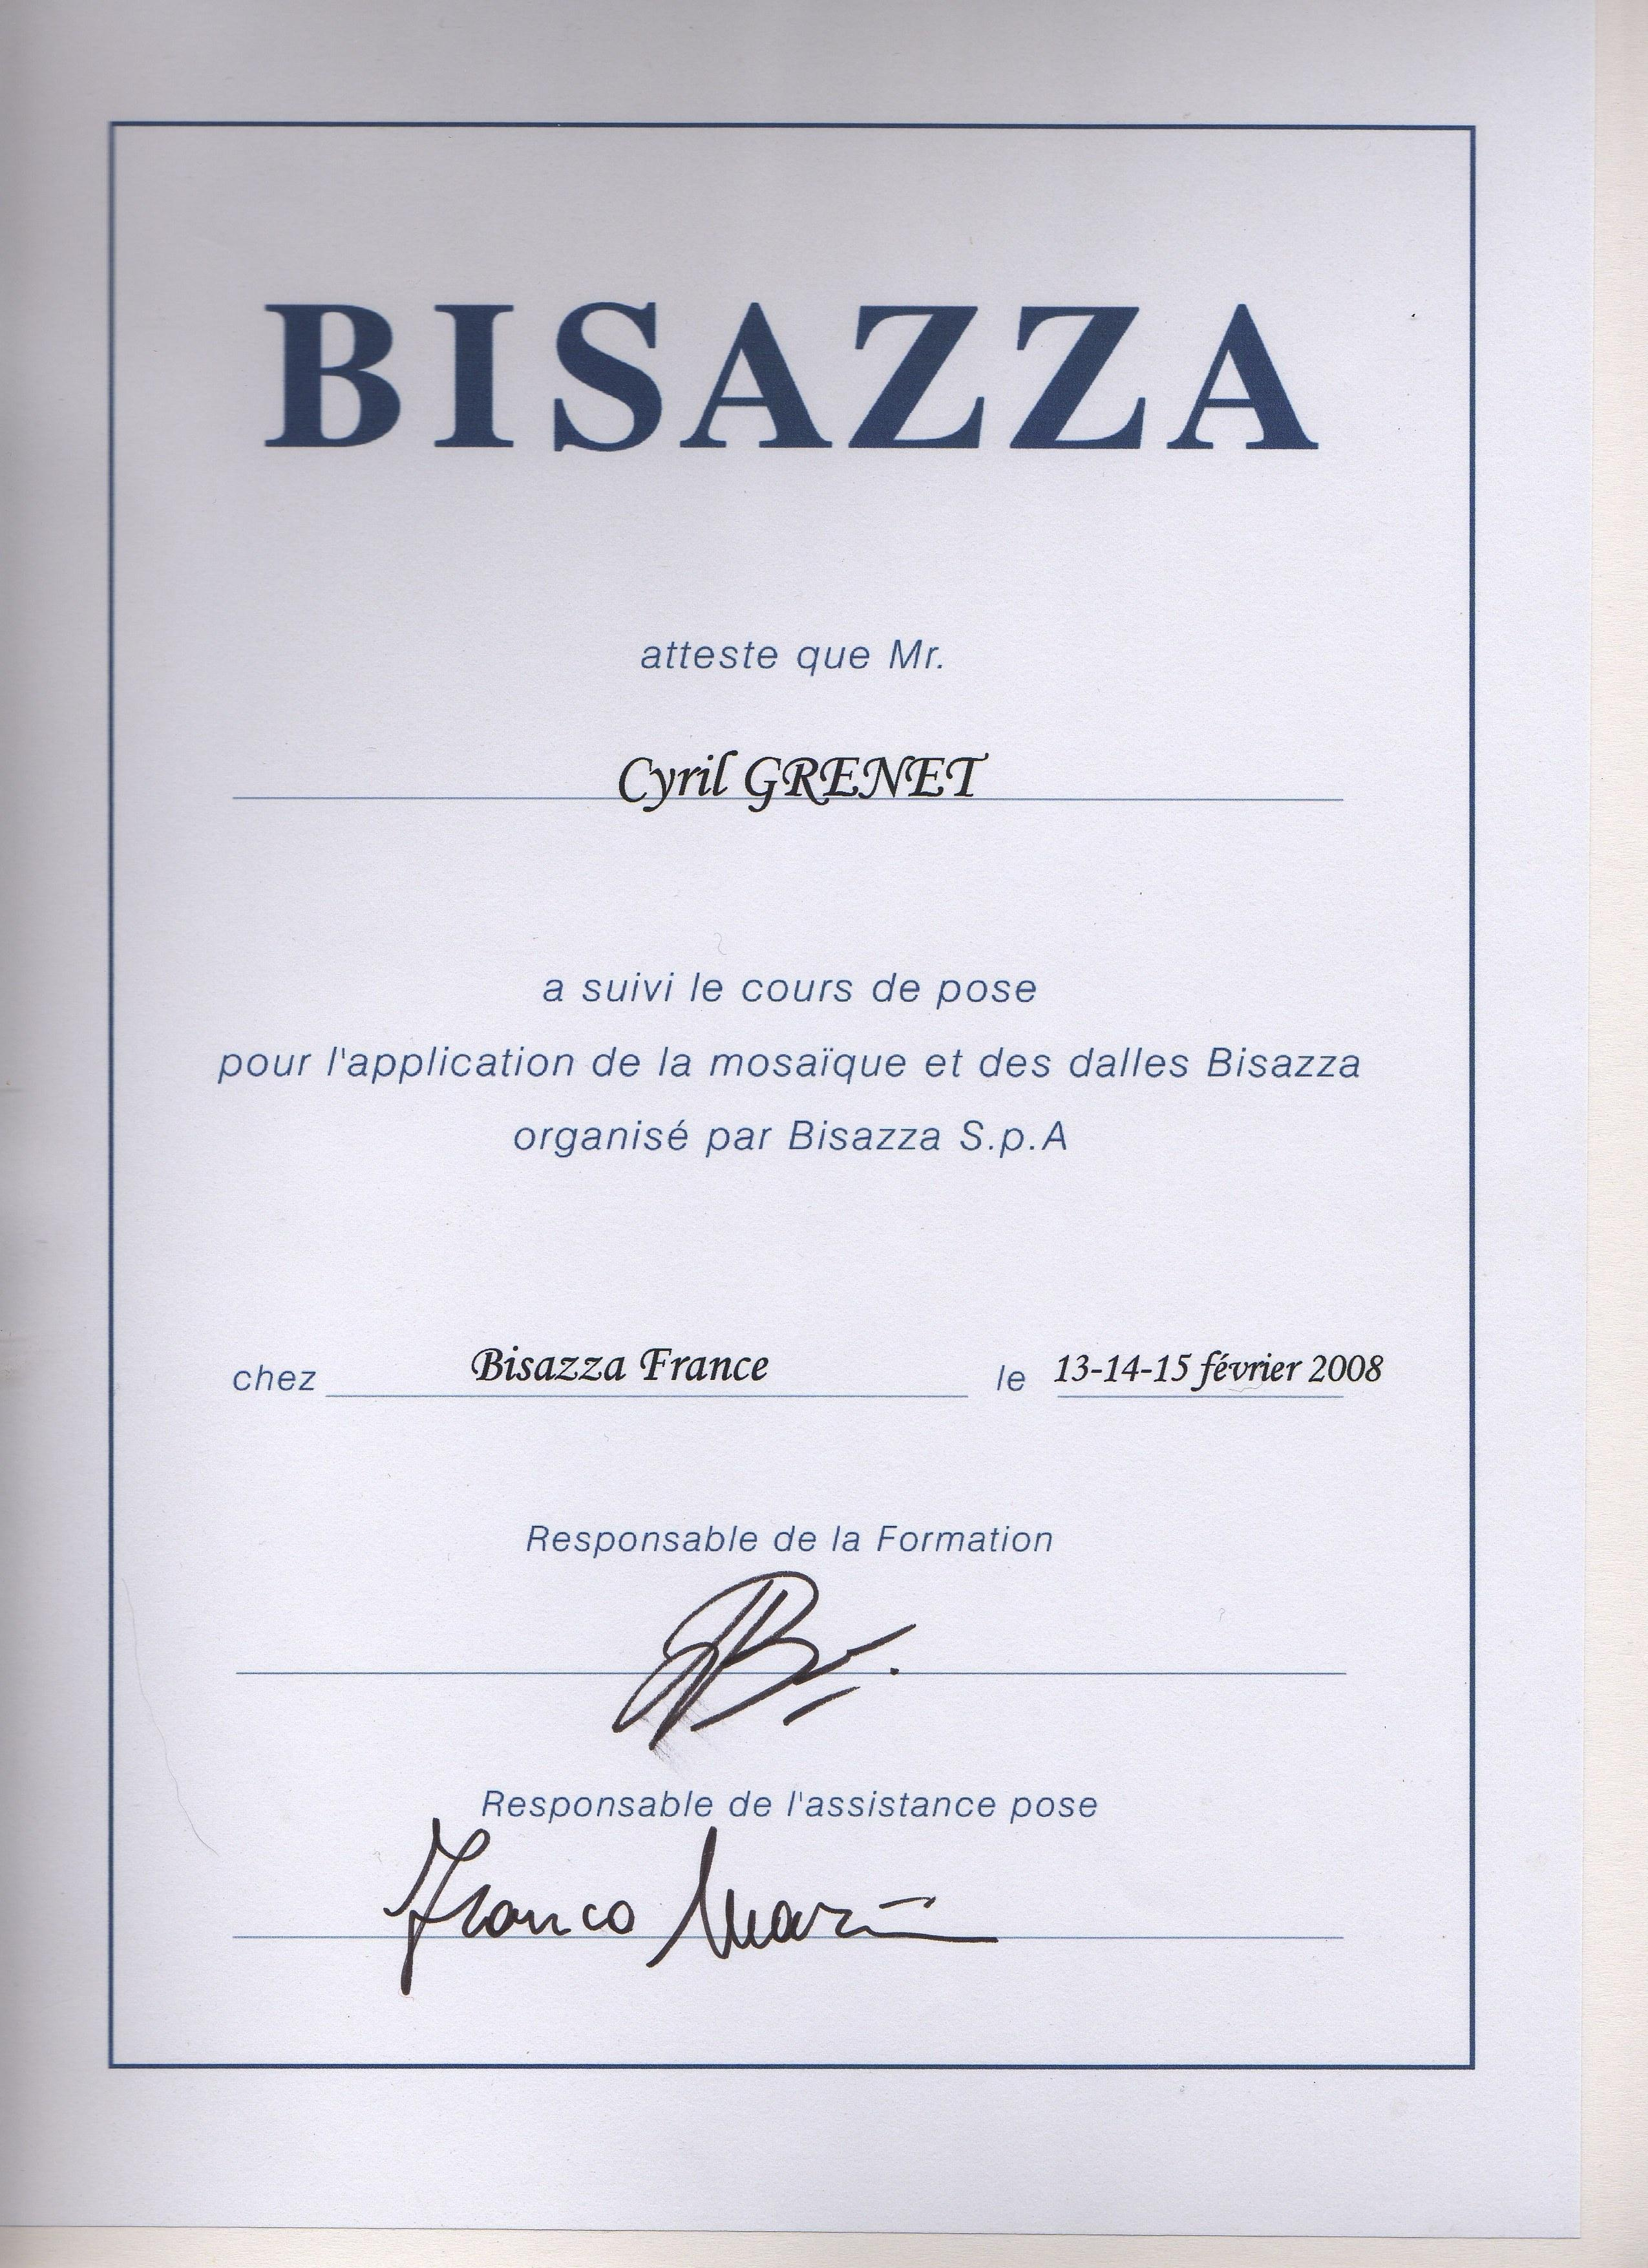 attestation de formation chez bisazza